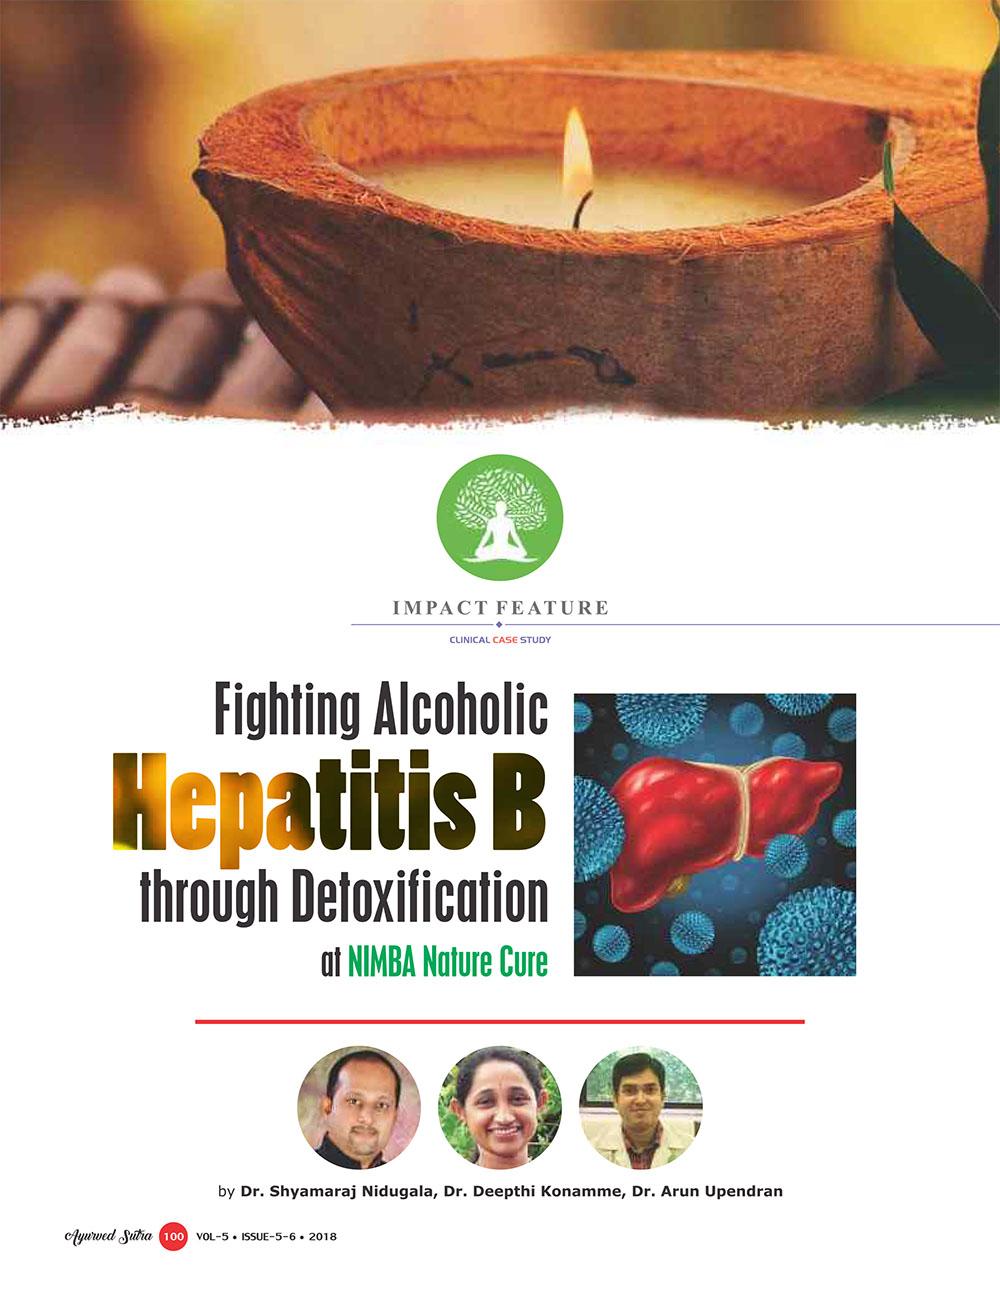 Ayurvedsutra Vol 05 issue 05 06 102 - Fighting Alcoholic Hepatitis B through Detoxification